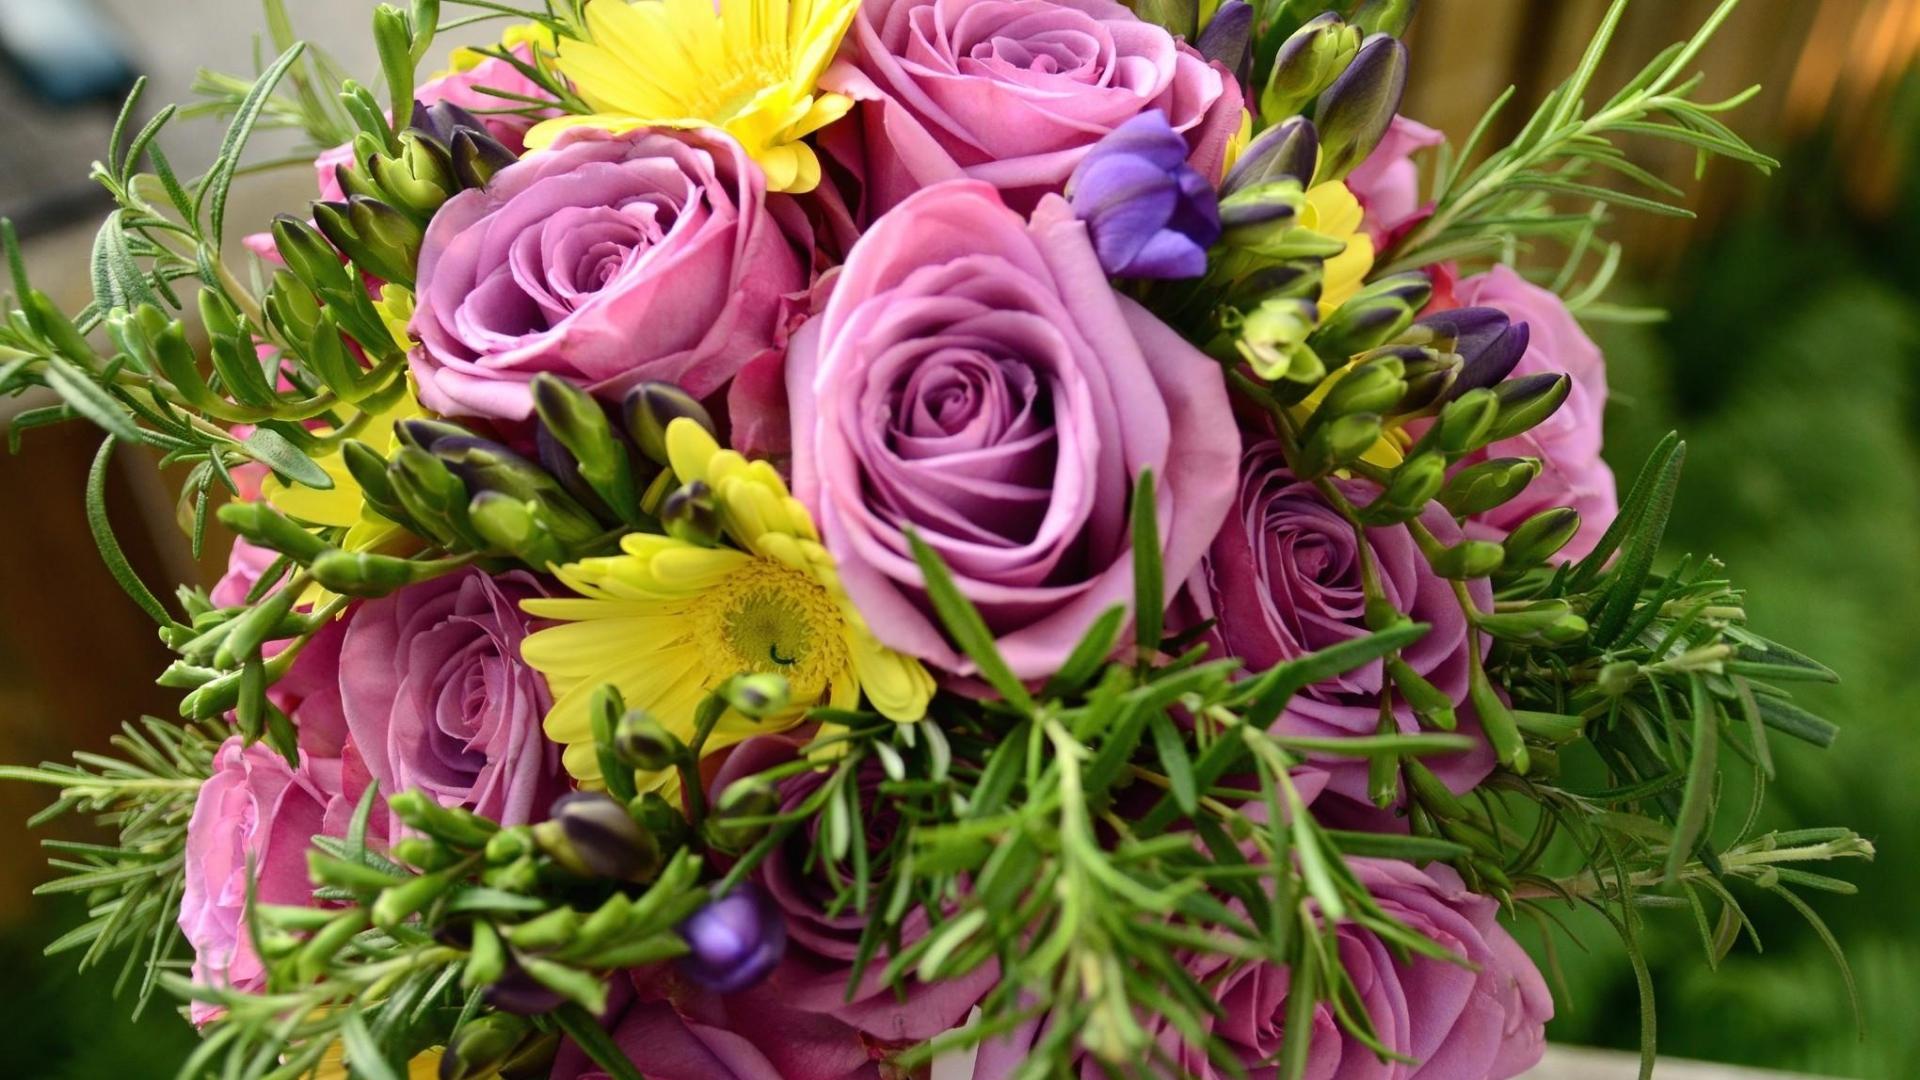 Download wallpaper 1920x1080 roses freesia flowers daffodils roses freesia flowers izmirmasajfo Gallery